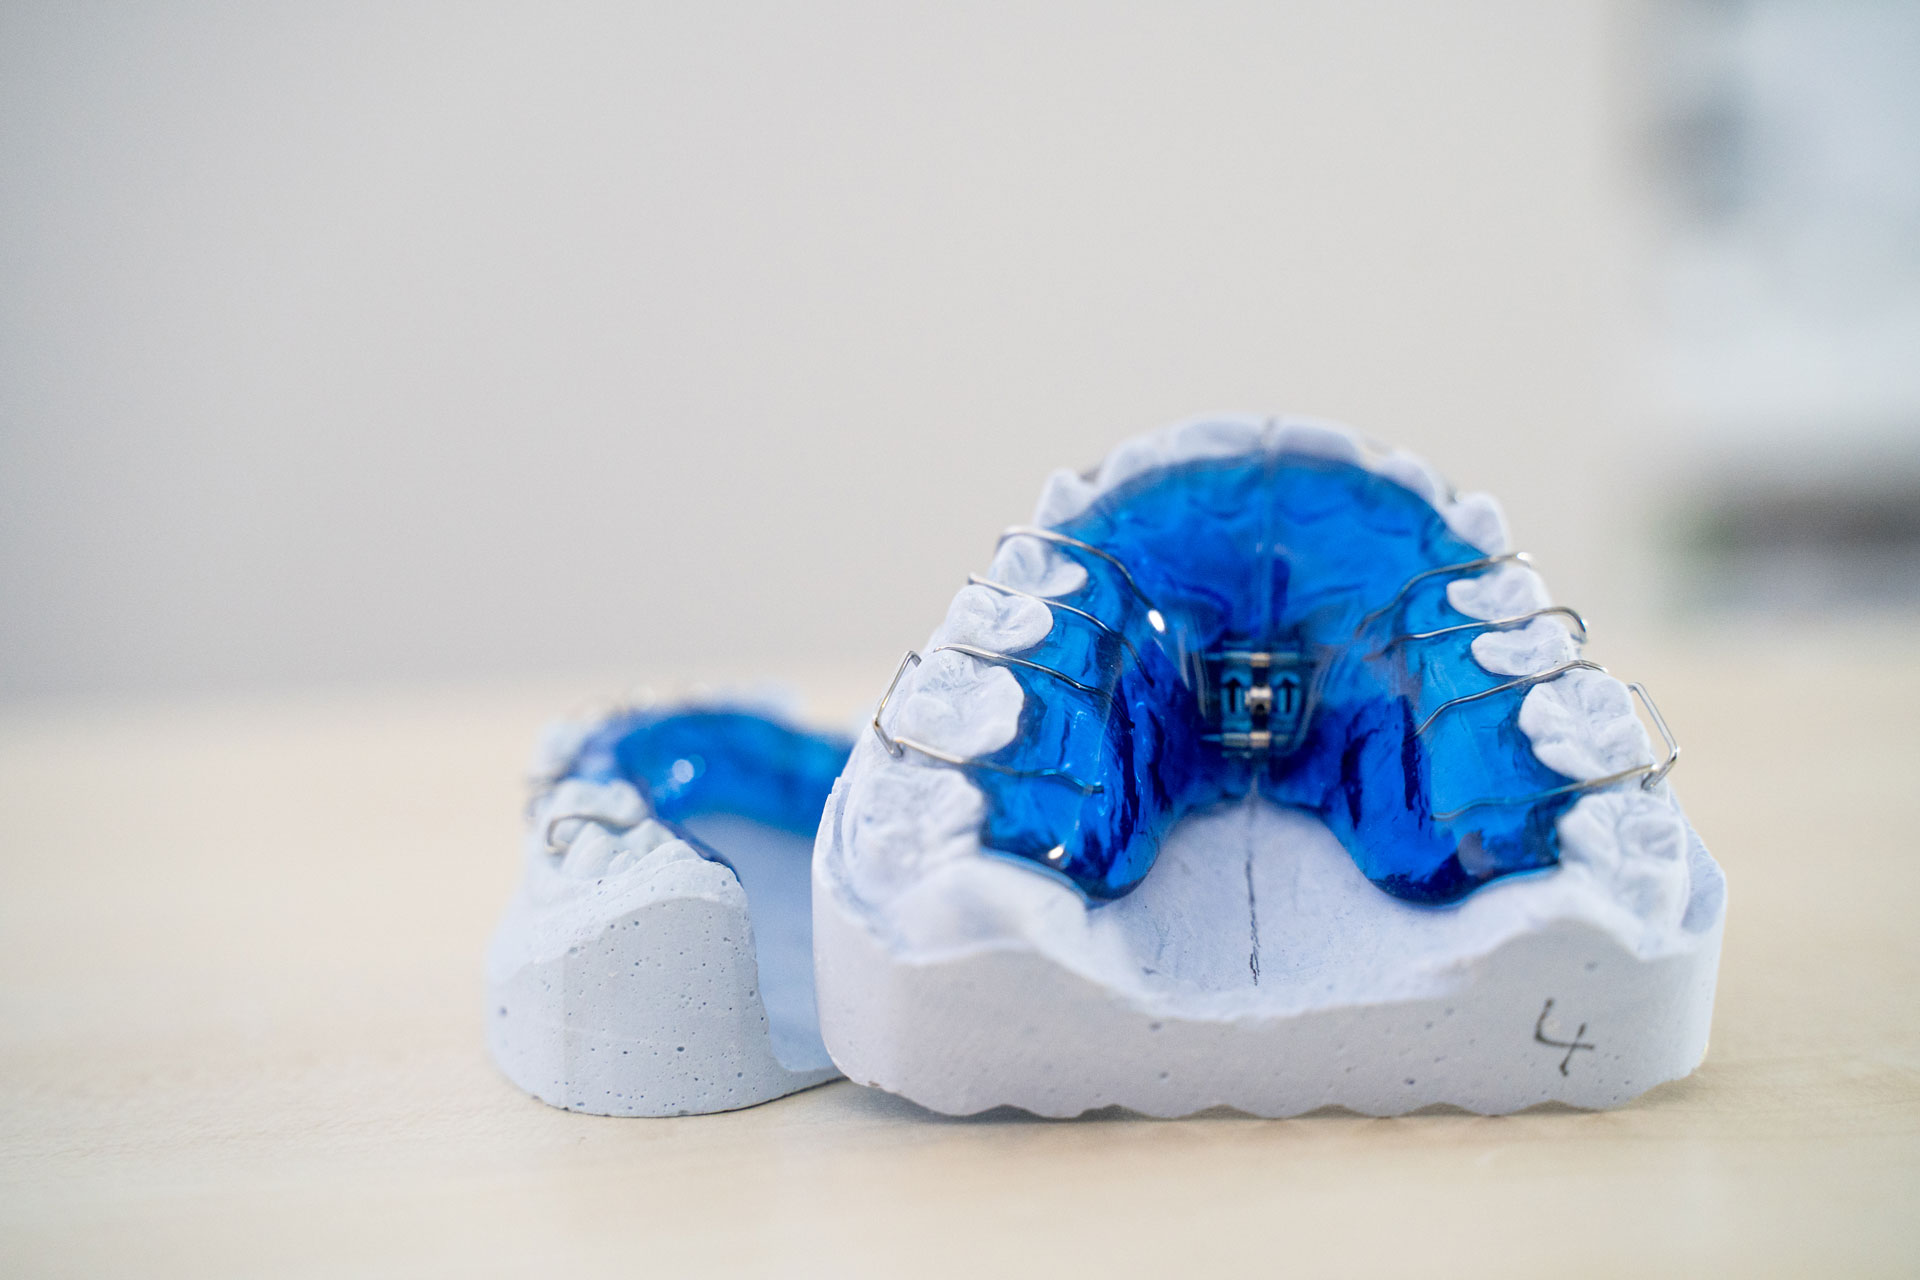 Produktfotos Dental | Produktfotografie | Fotoshooting Medizin